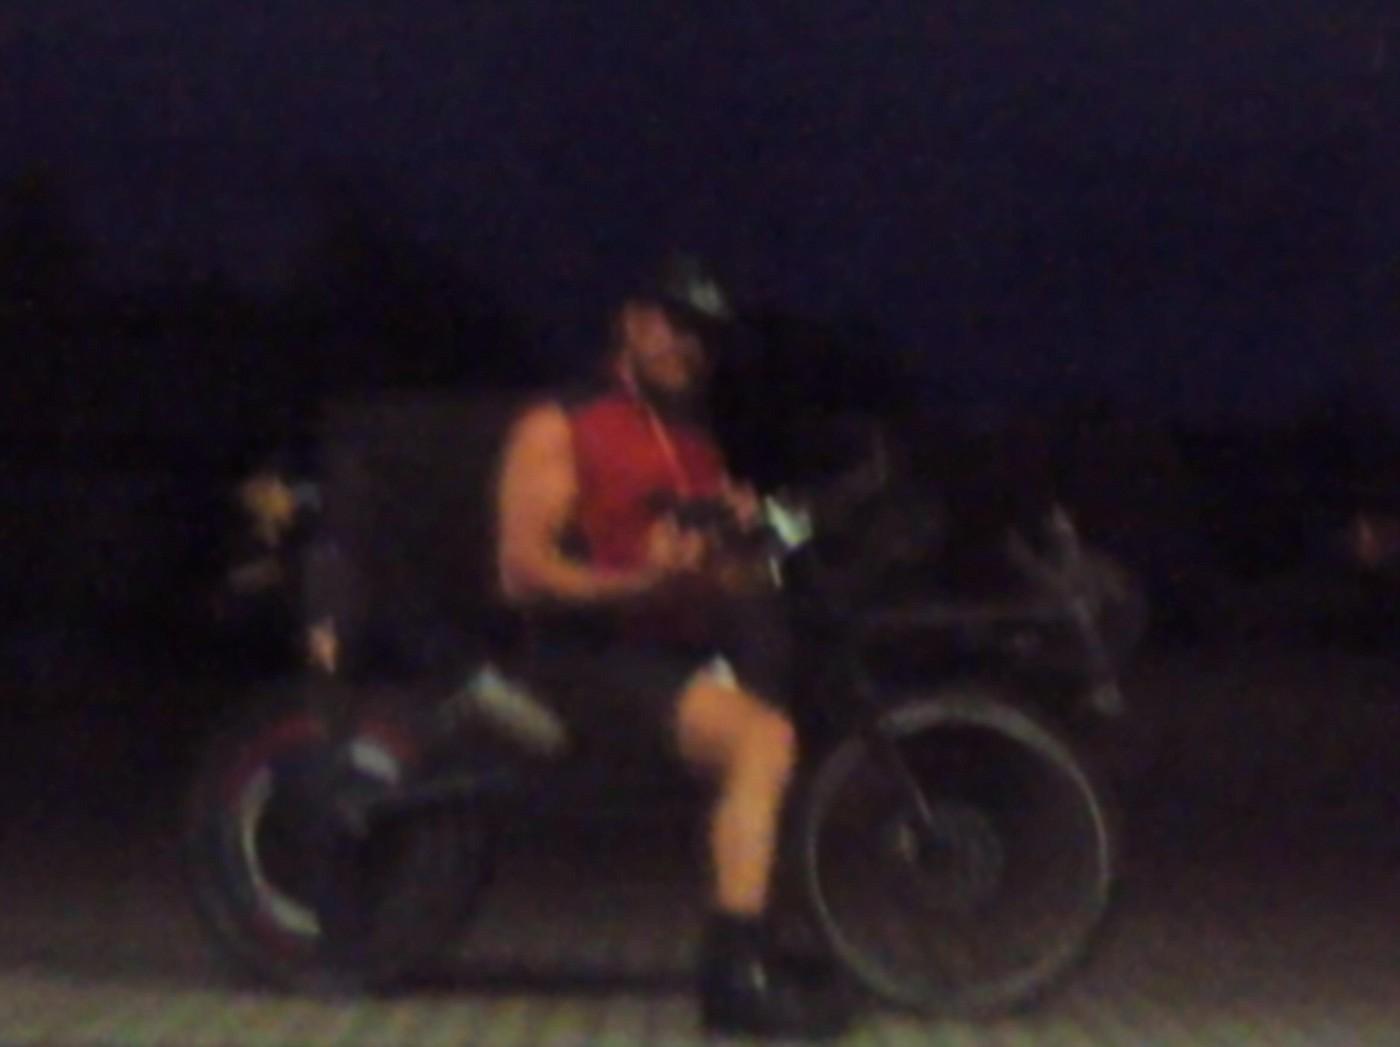 Melted Nightrider